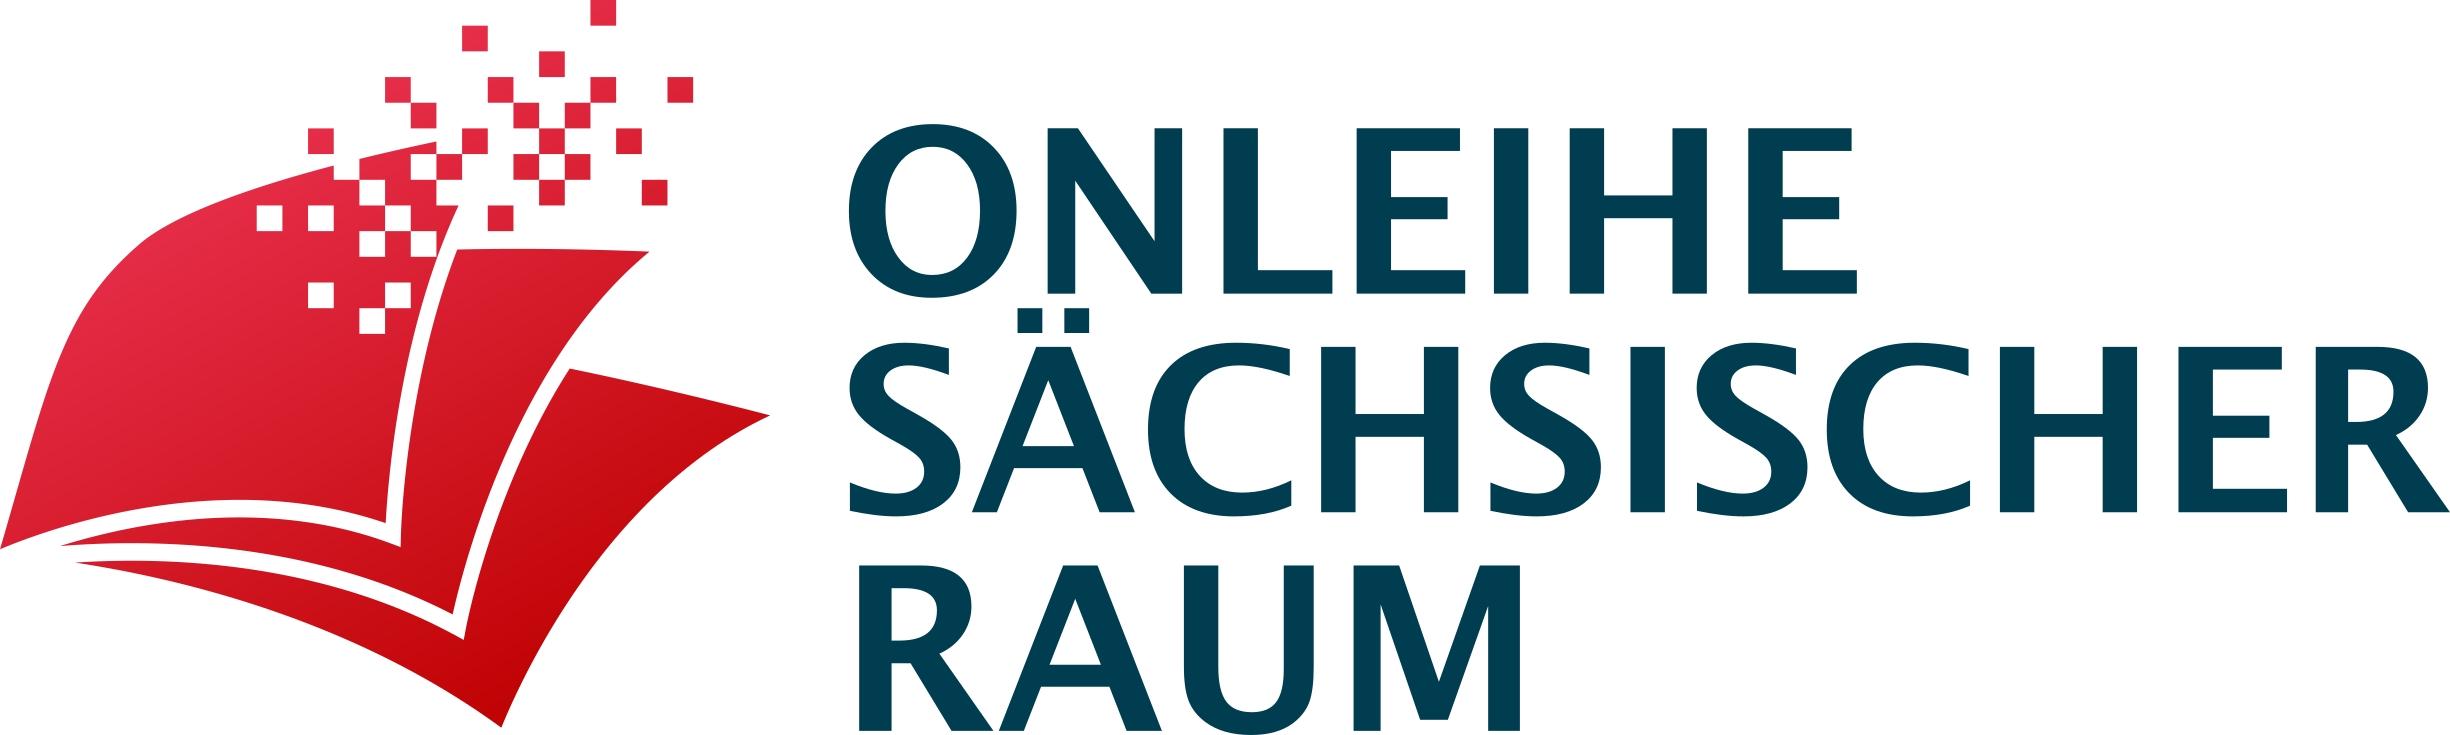 https://freital.bbopac.de/public/img/37/Logo_Onleihe_S%c3%a4chsischer_Raum.jpg